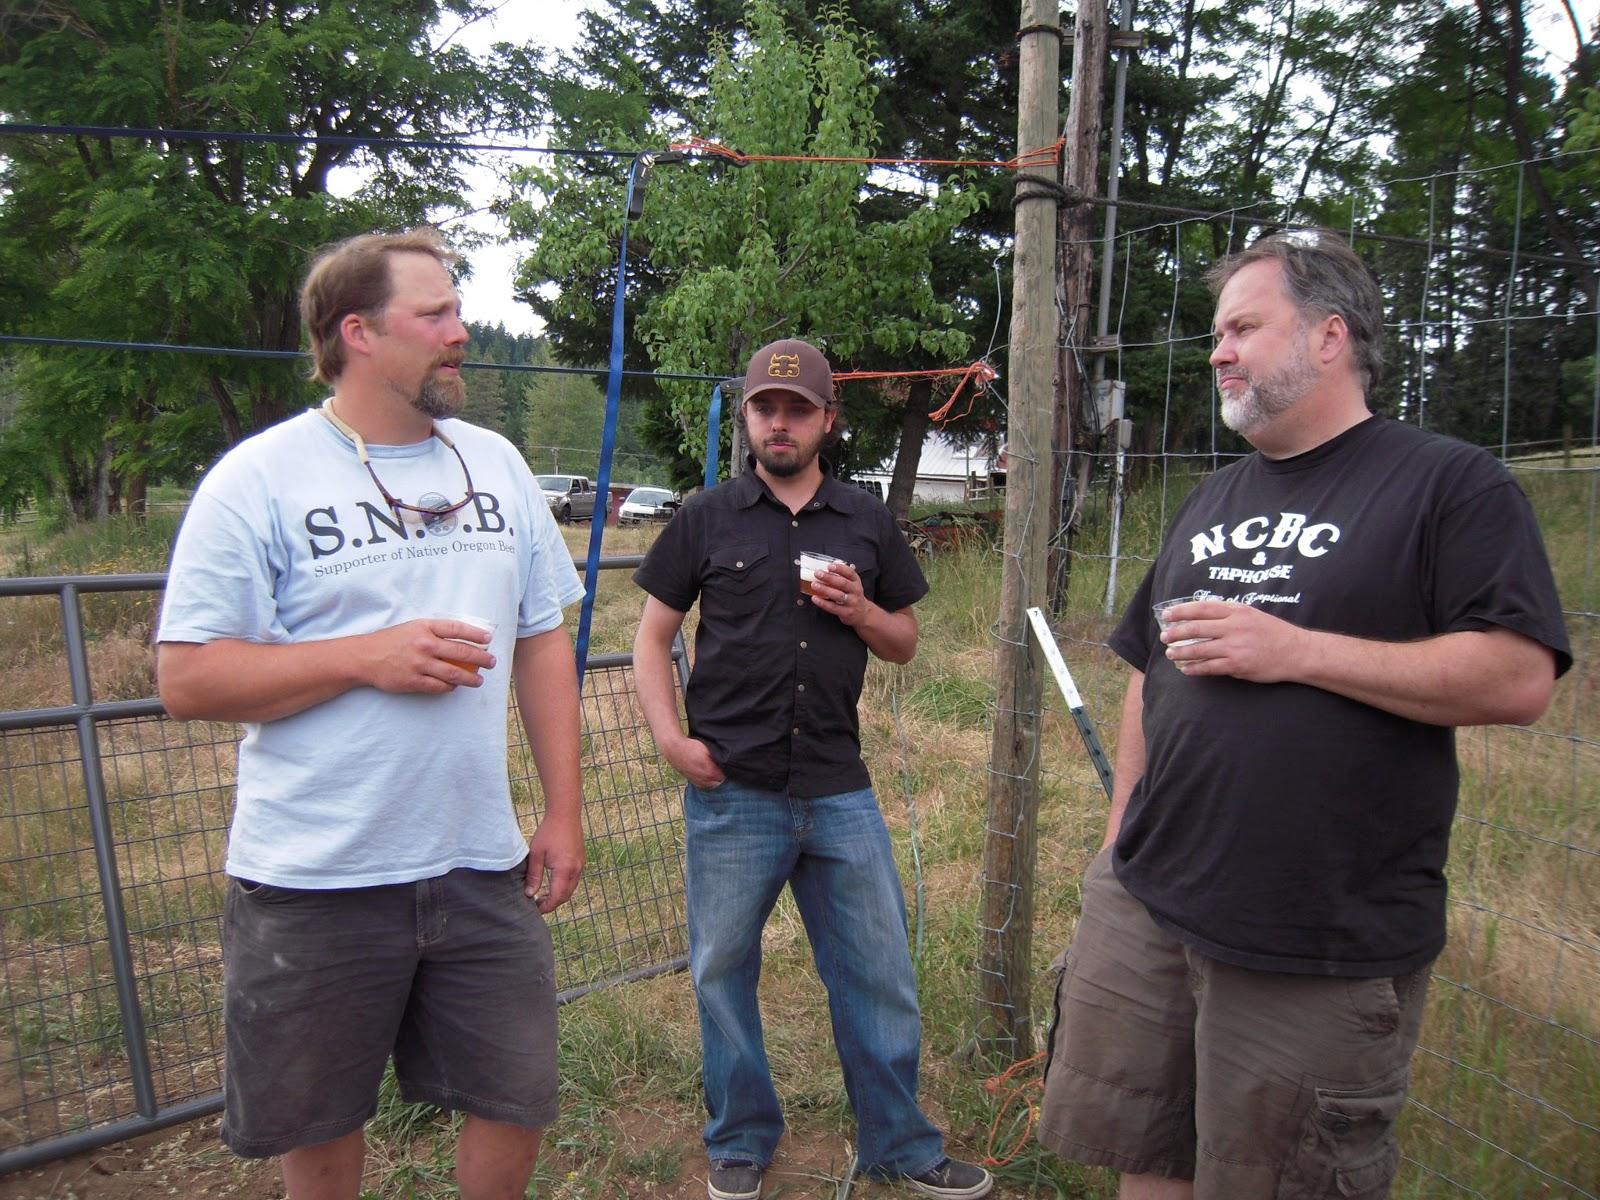 Logsdon Farmhouse Ales Chuck Porter launches Bergschrund Signature Serie